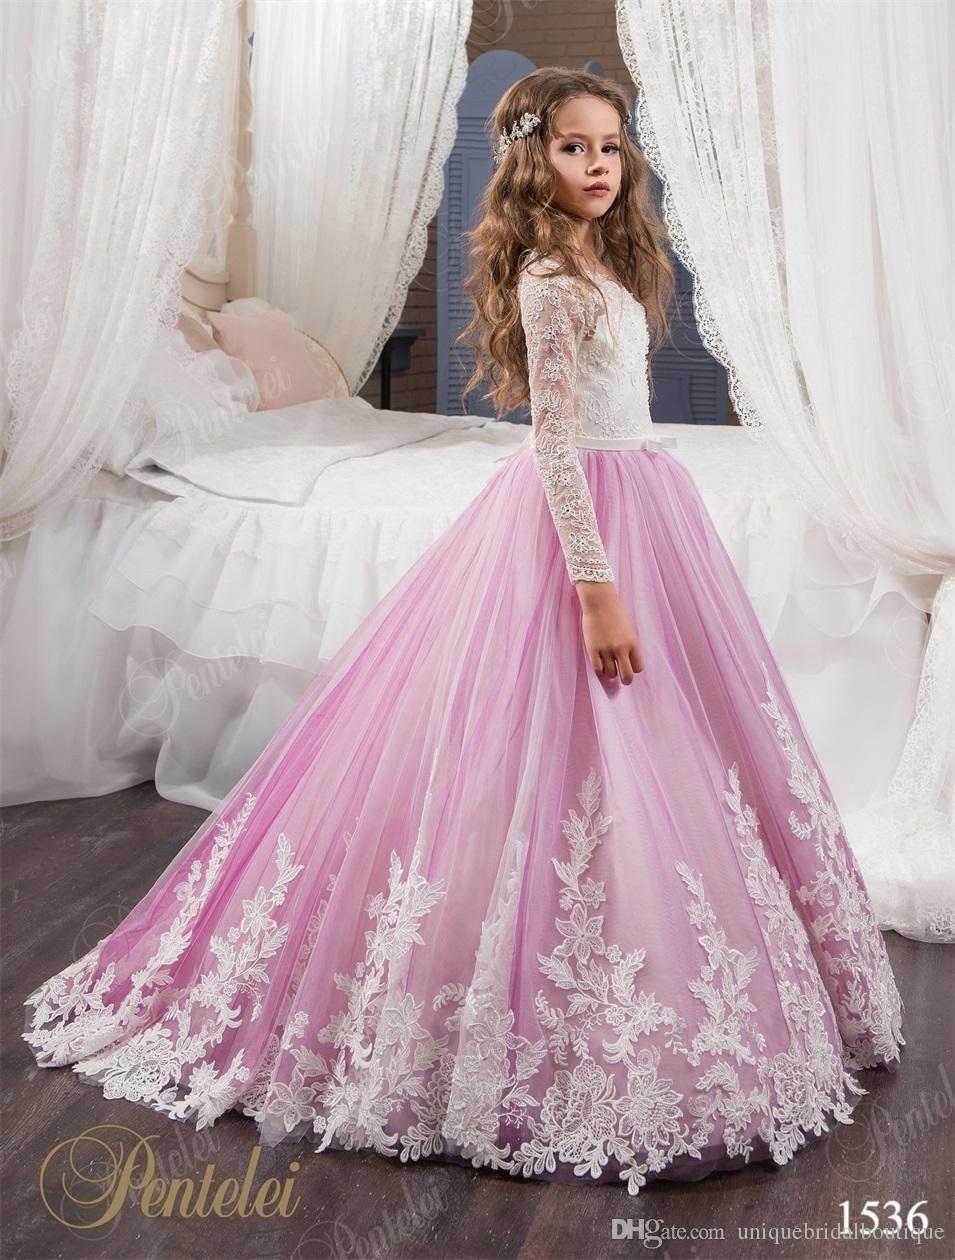 Little girl wedding dresses cute dresses for a wedding check more